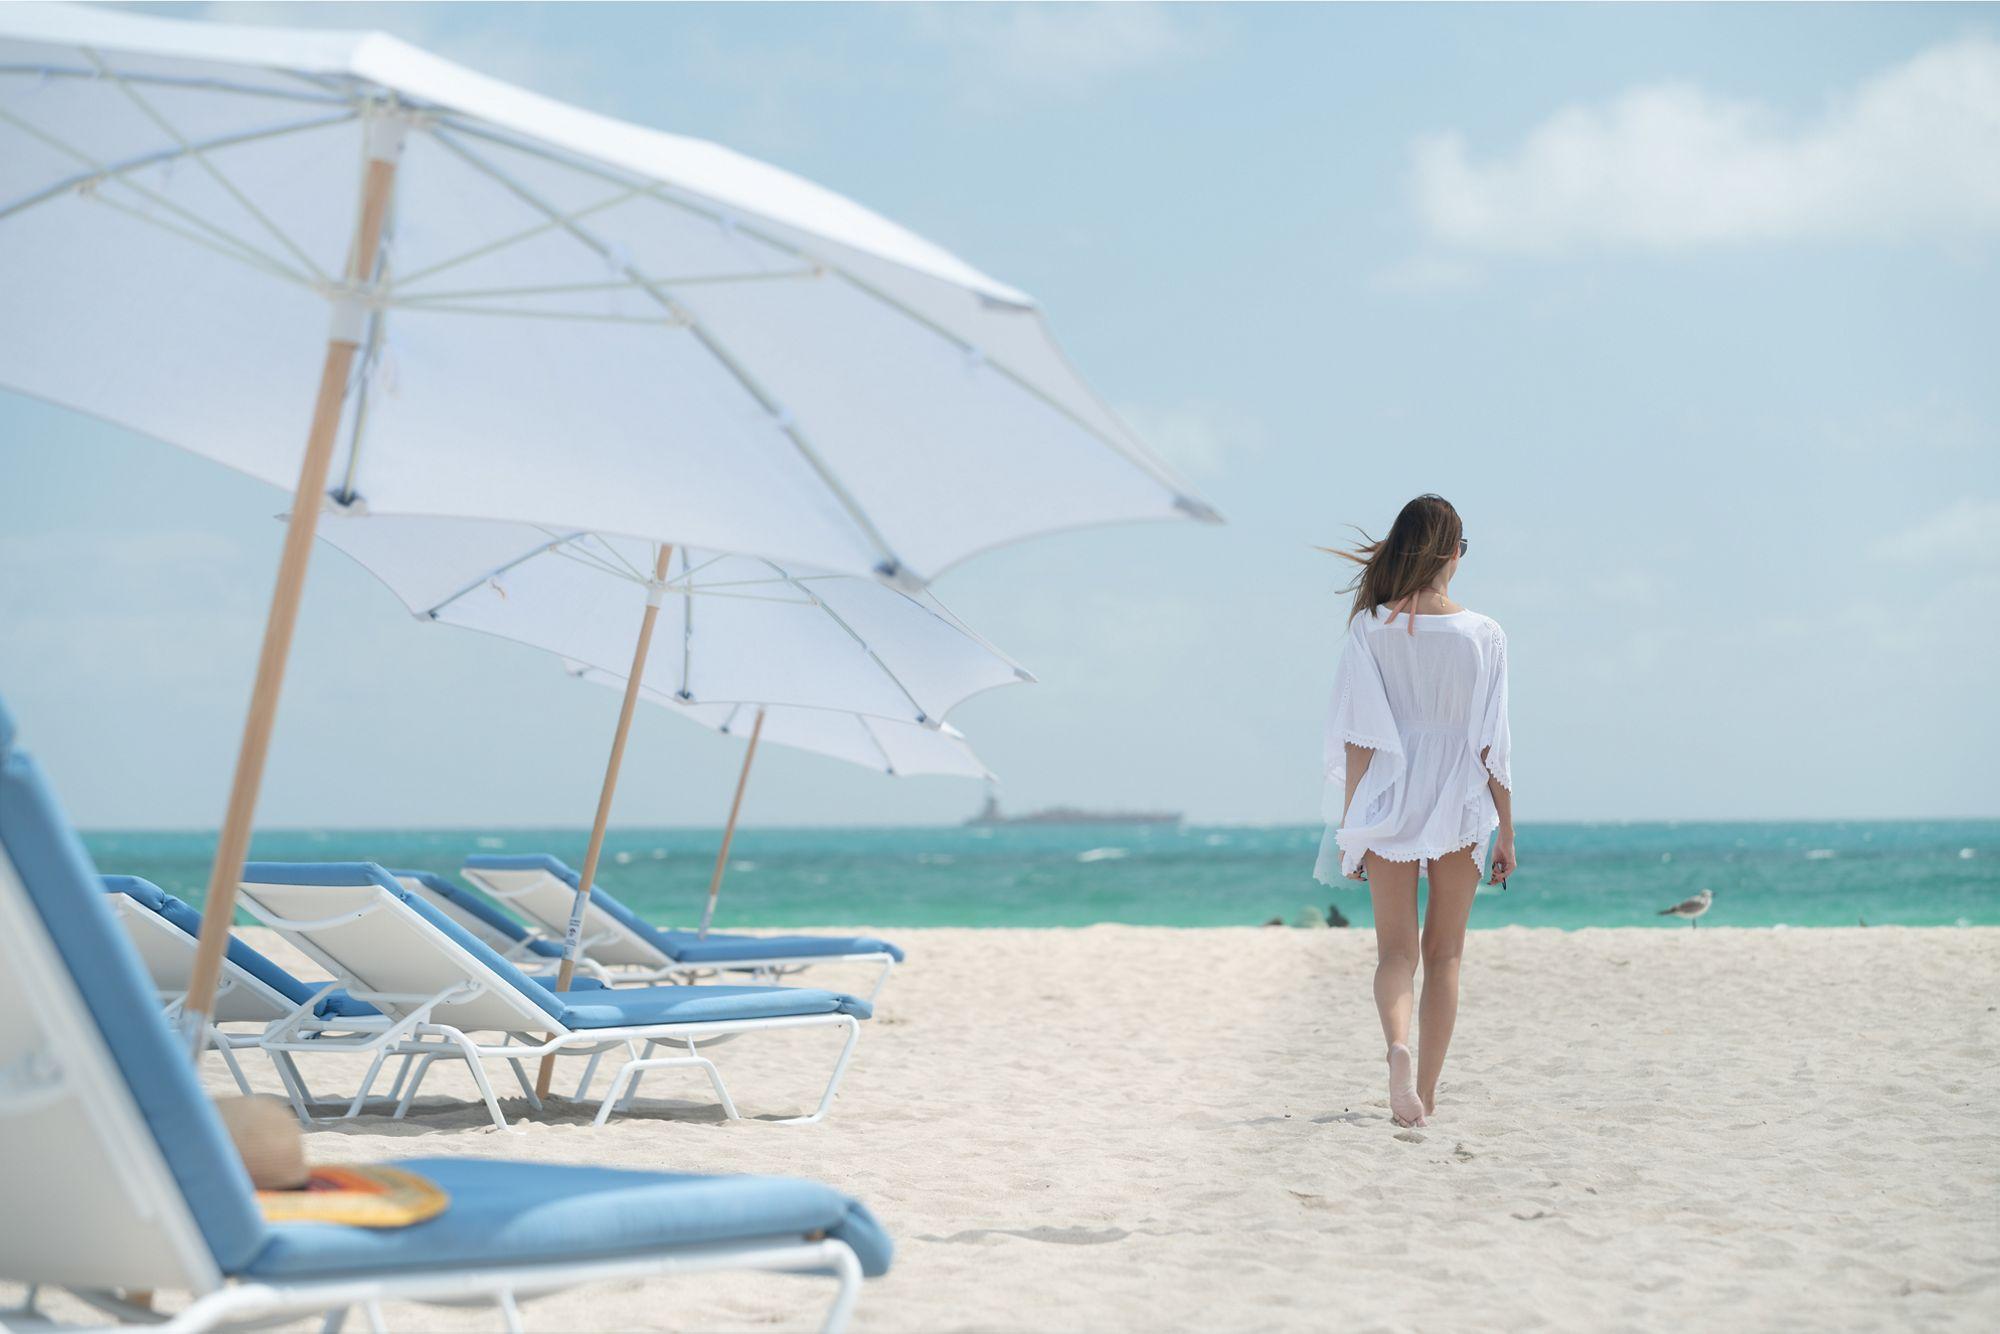 South Beach Miami Vacation Packages  The Ritz-Carlton, South Beach